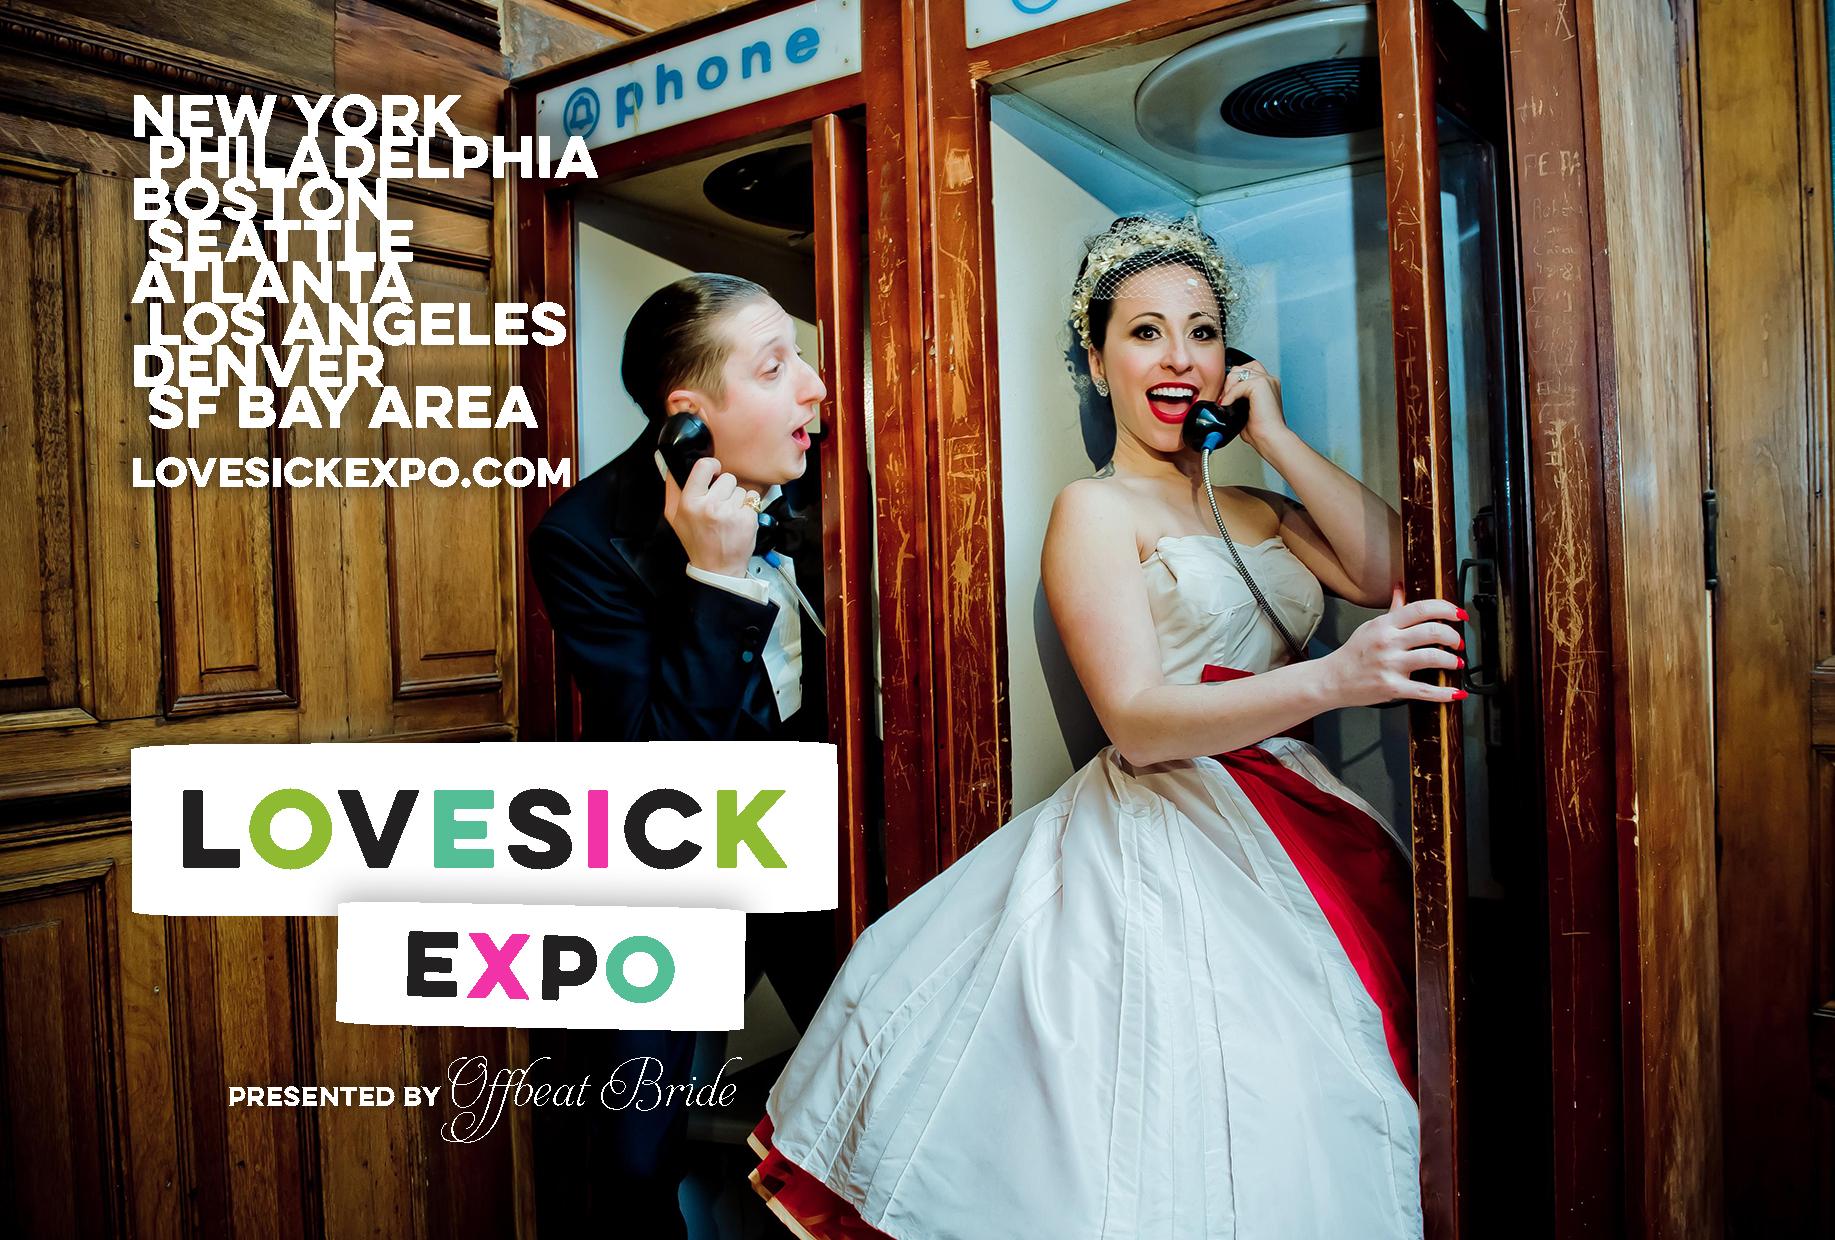 Denver Colorado Lovesick Vendor Offbeat Bride